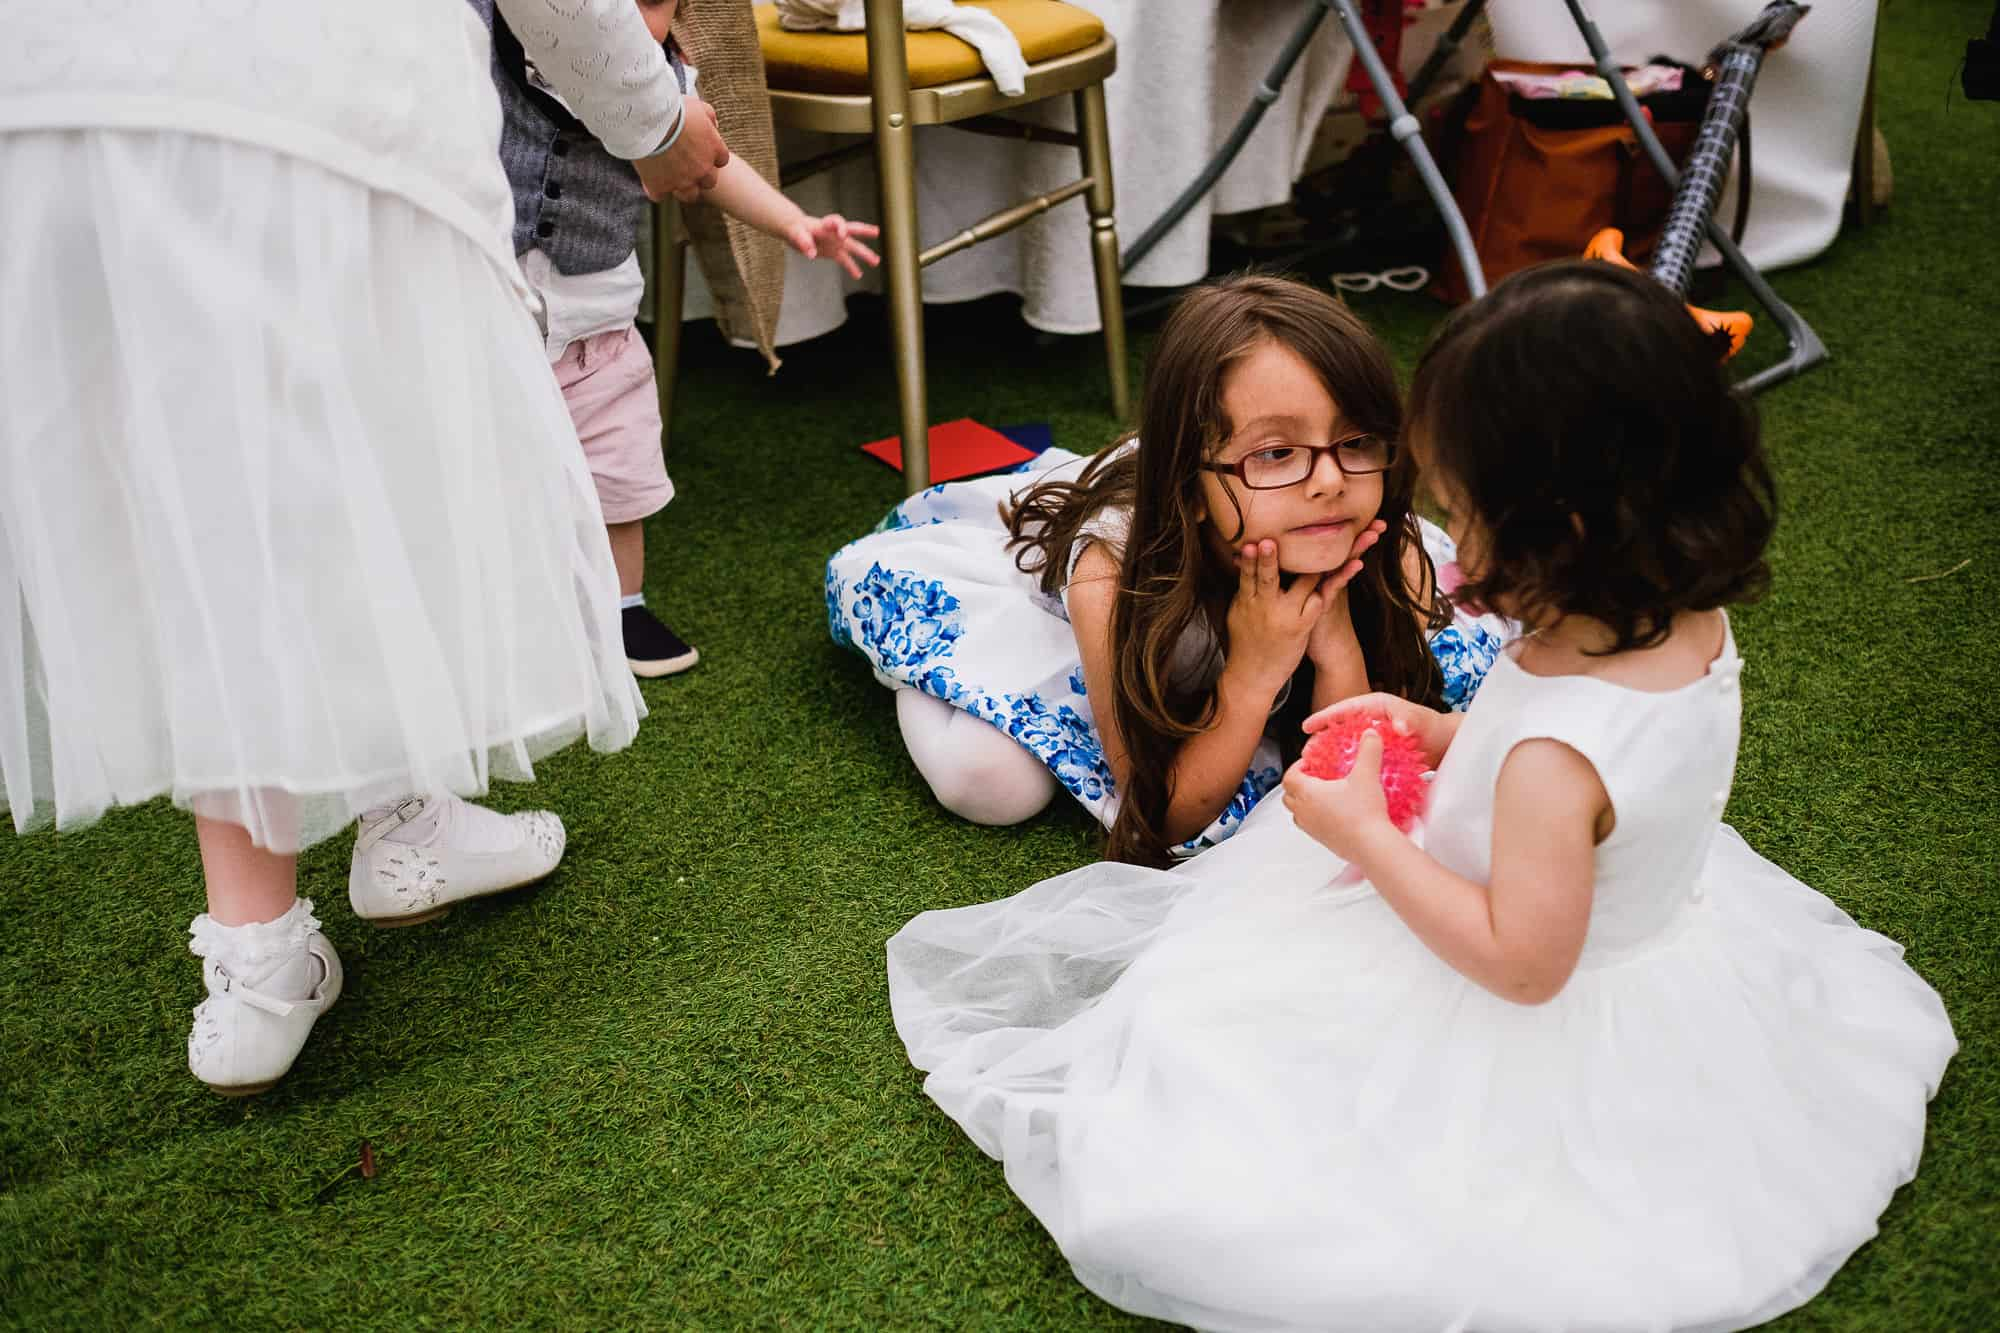 marleybrook-house-wedding-photography-matt-tyler-0051